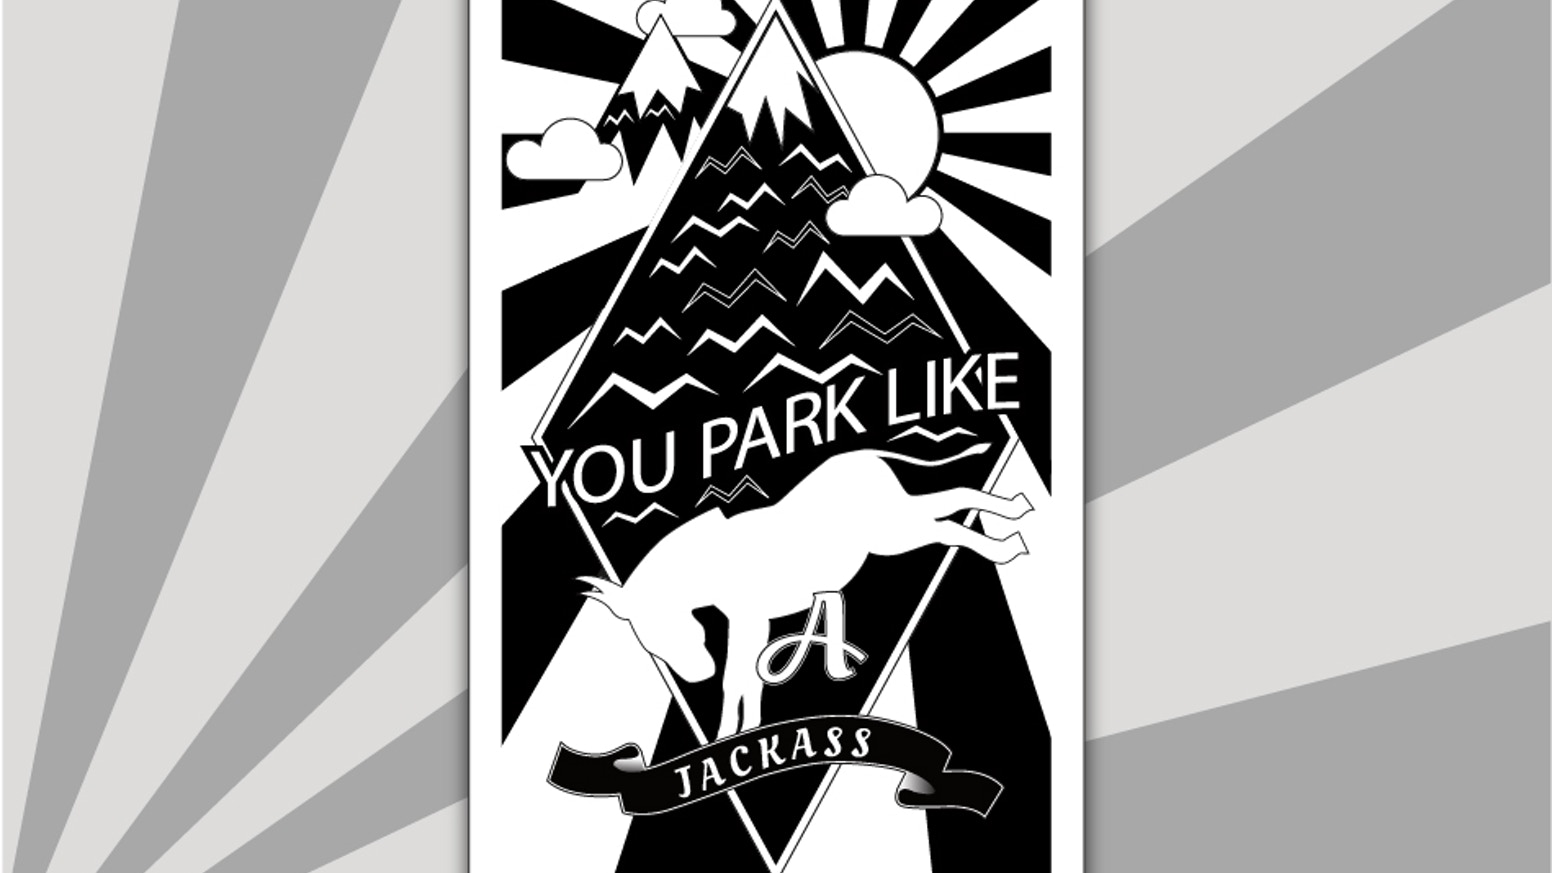 Bad parking business cards by josh avren faq kickstarter bad parking business cards reheart Choice Image